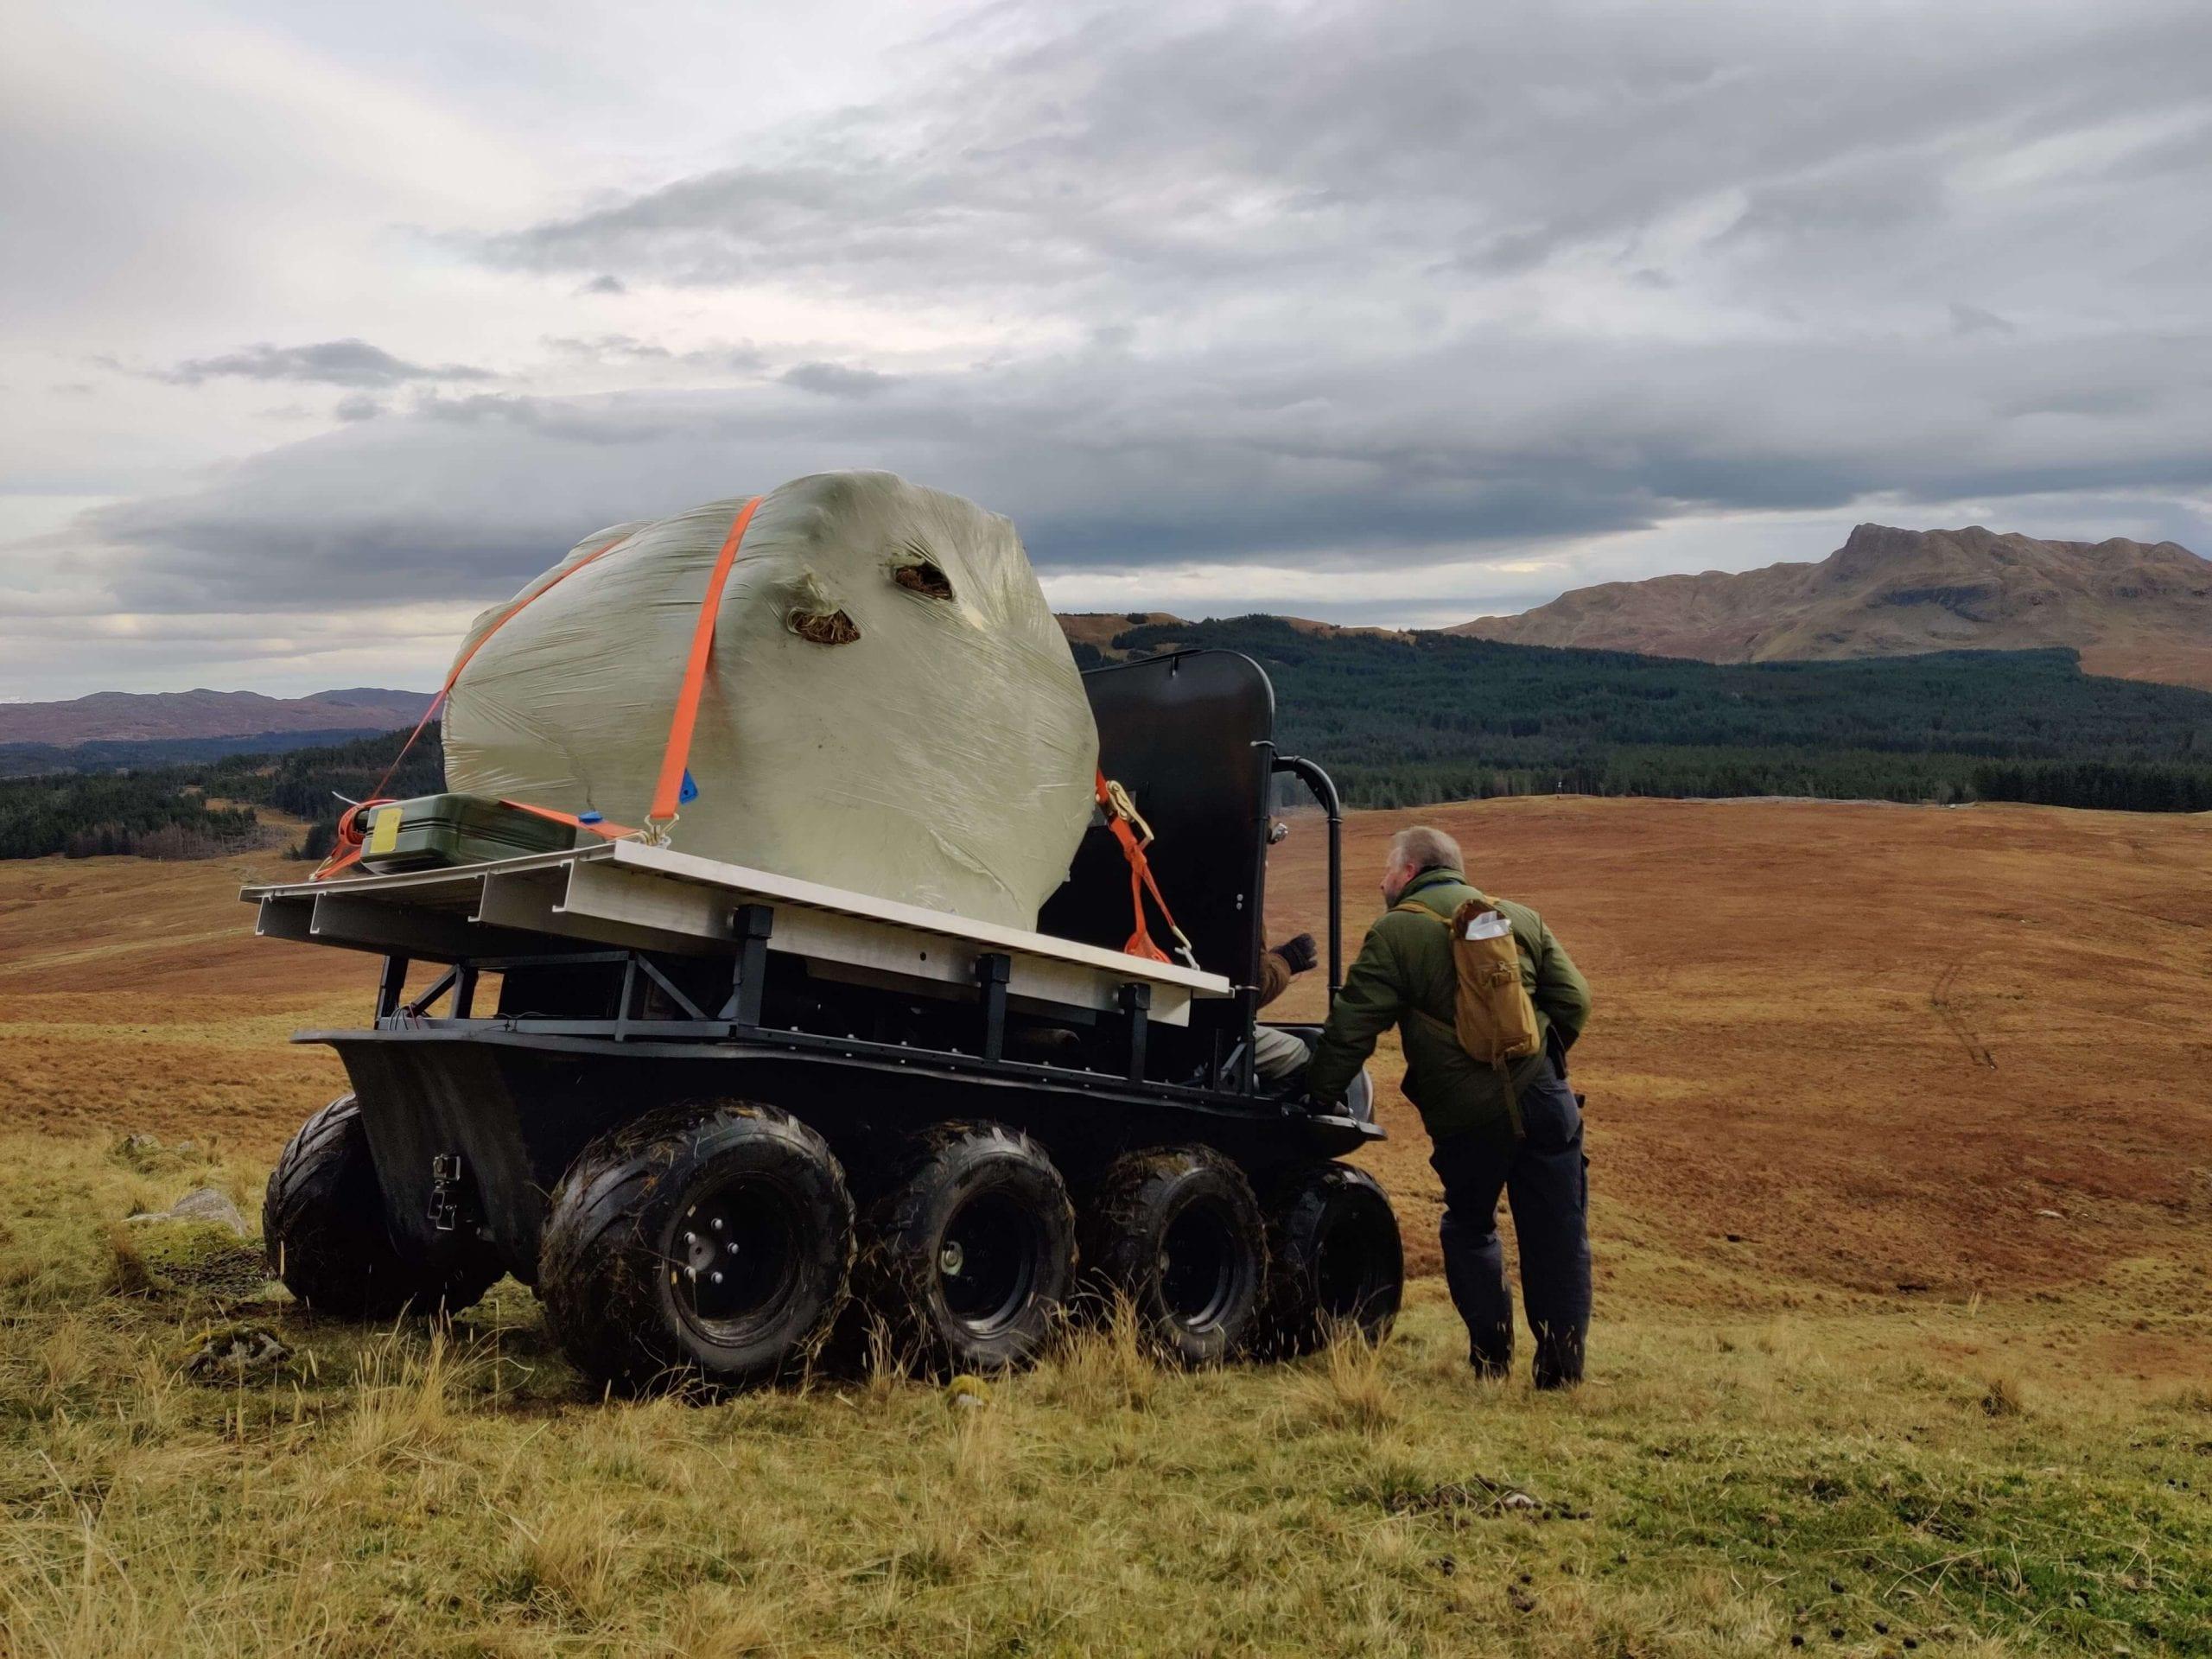 Hydraulic motor for all-terrain vehicle